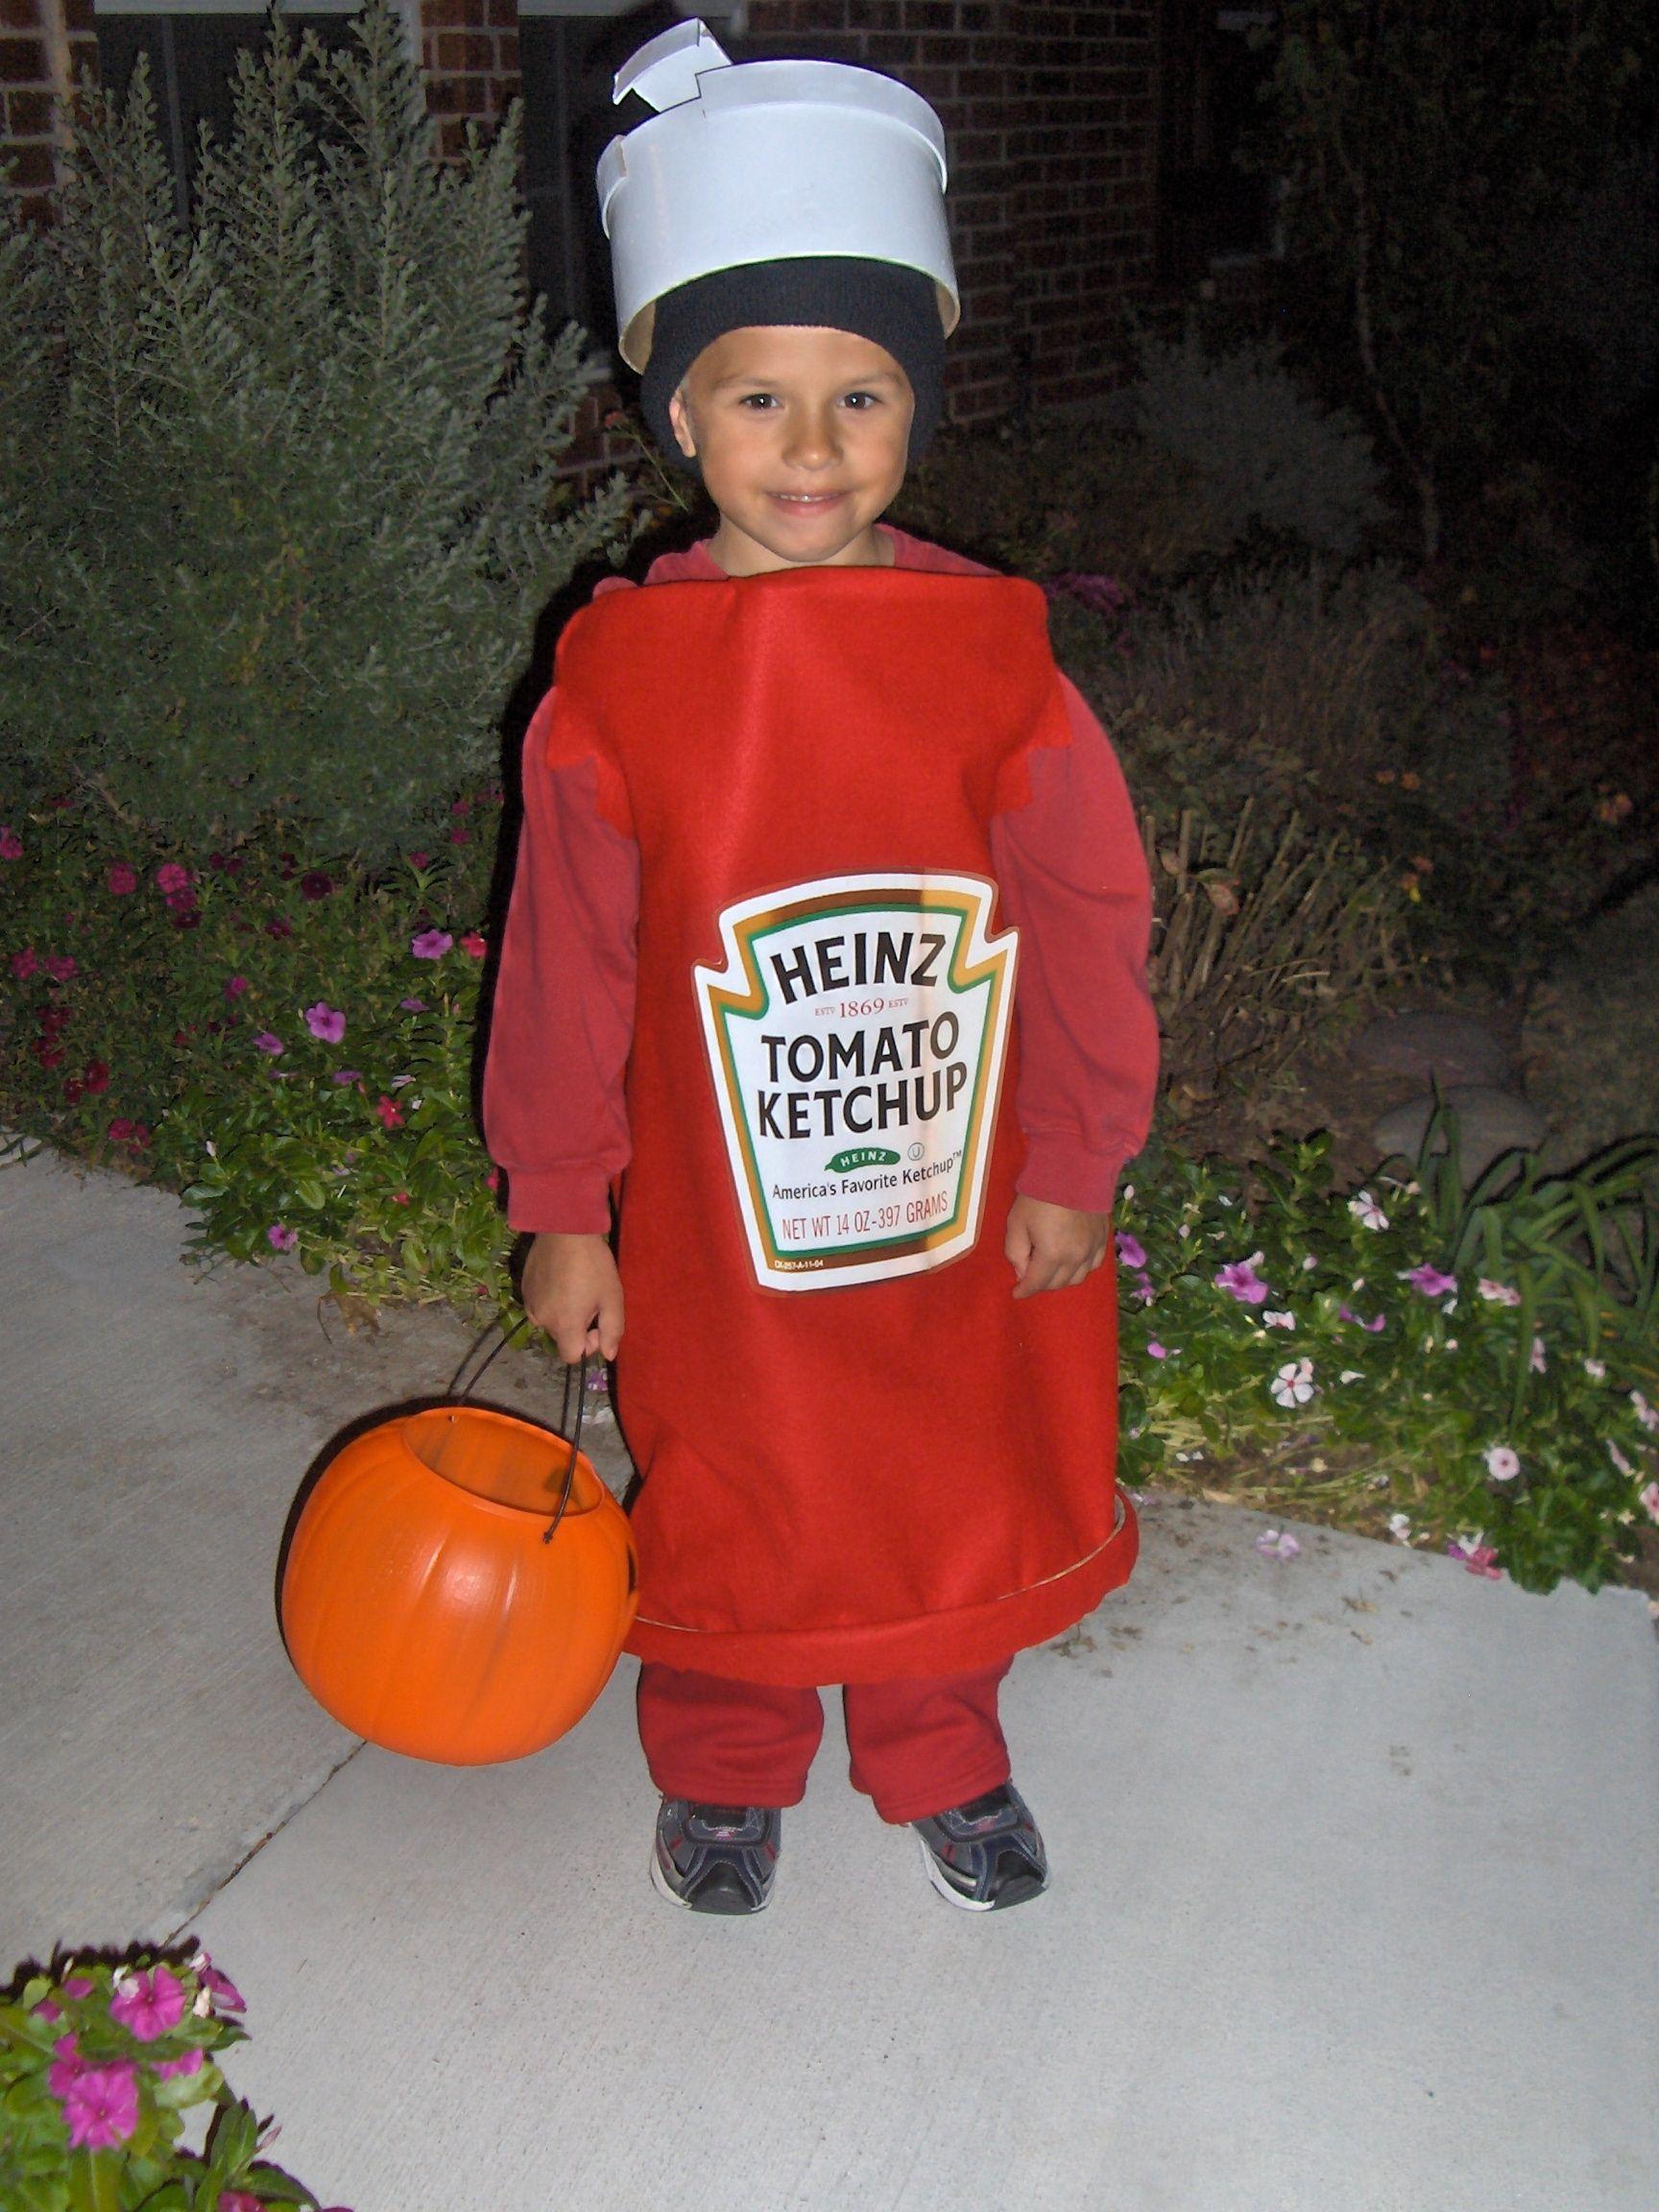 DIY Unique Last Minute Food Halloween Costumes ... |Diy Halloween Costumes Food